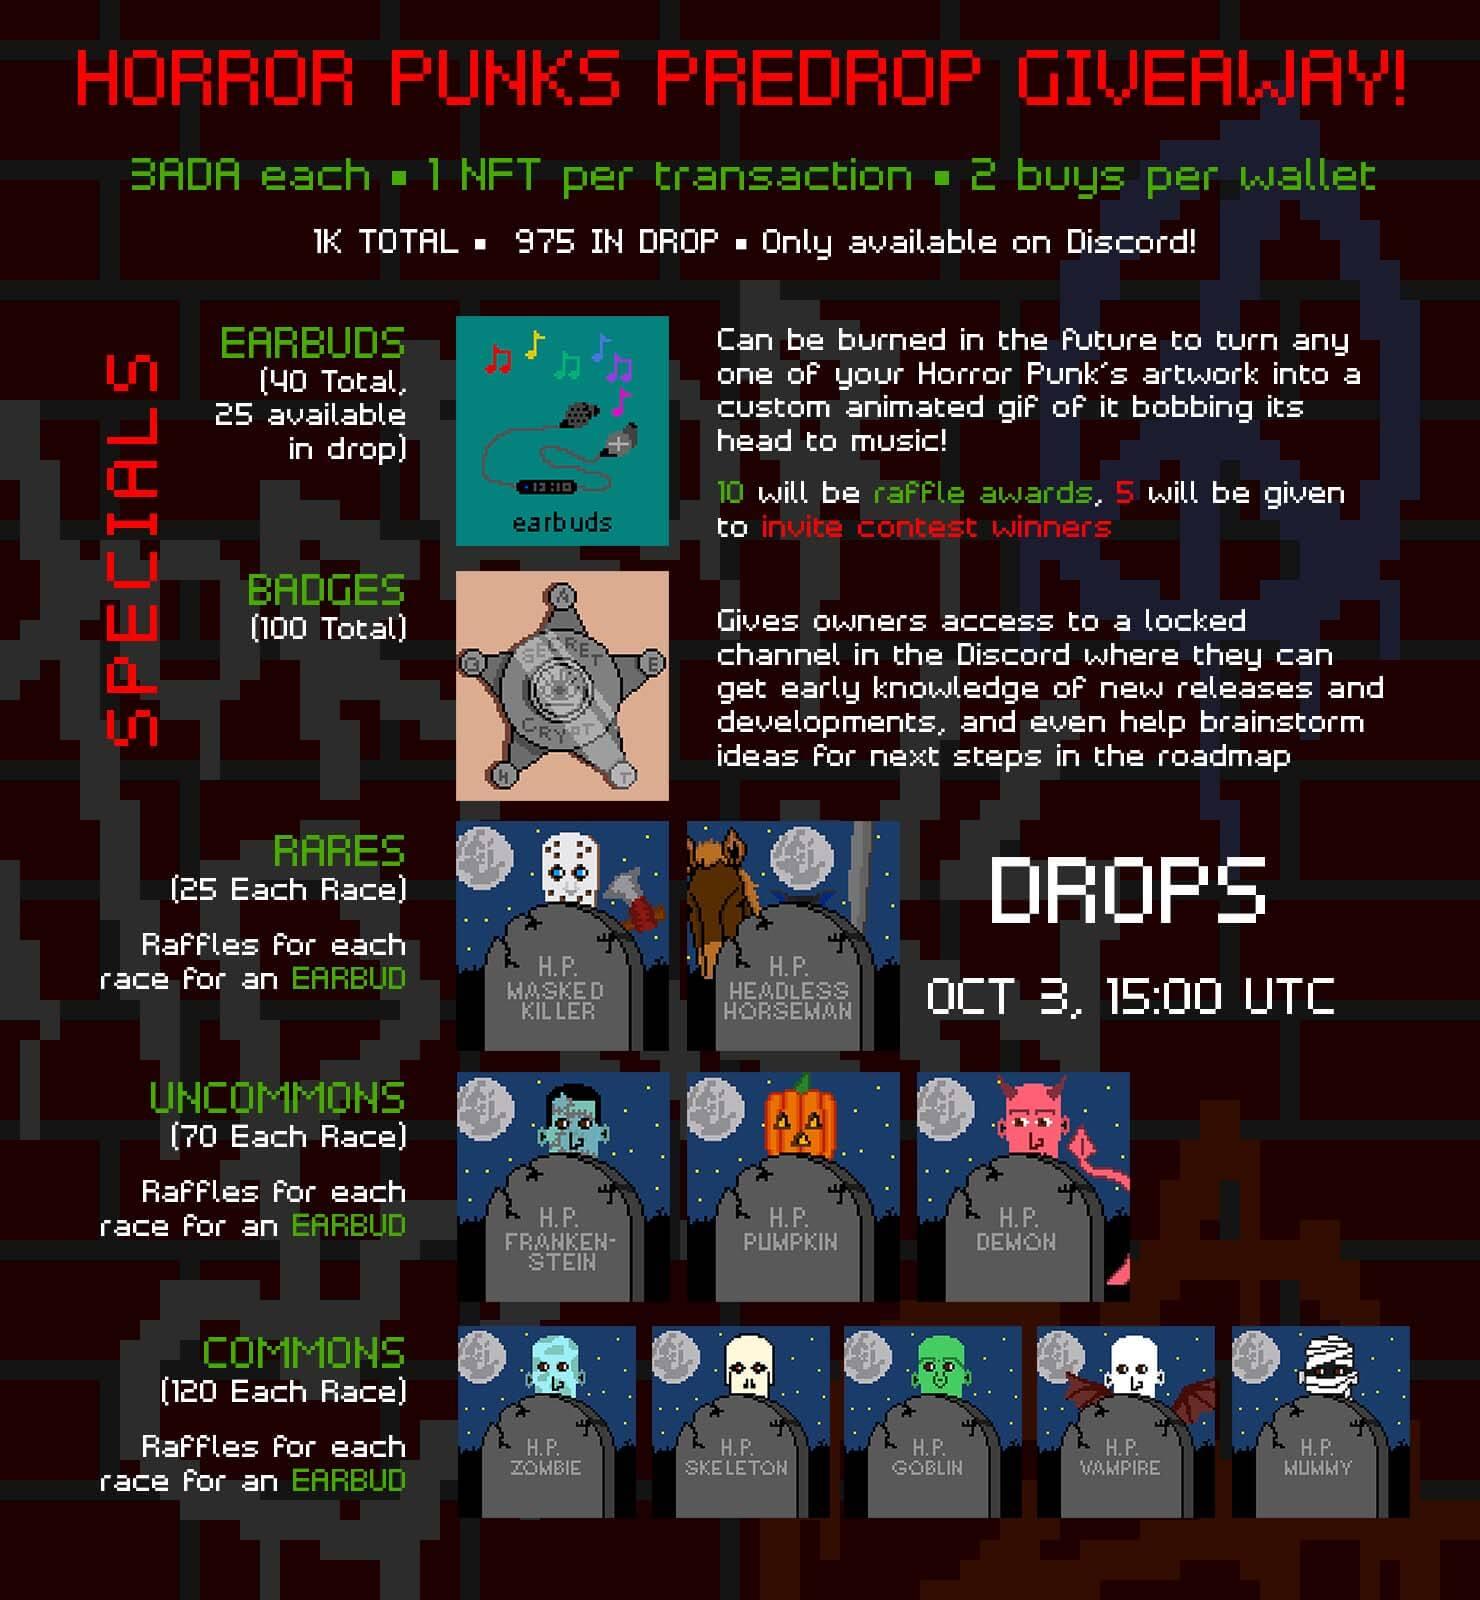 Horror Punks Pre-Drop Giveaway